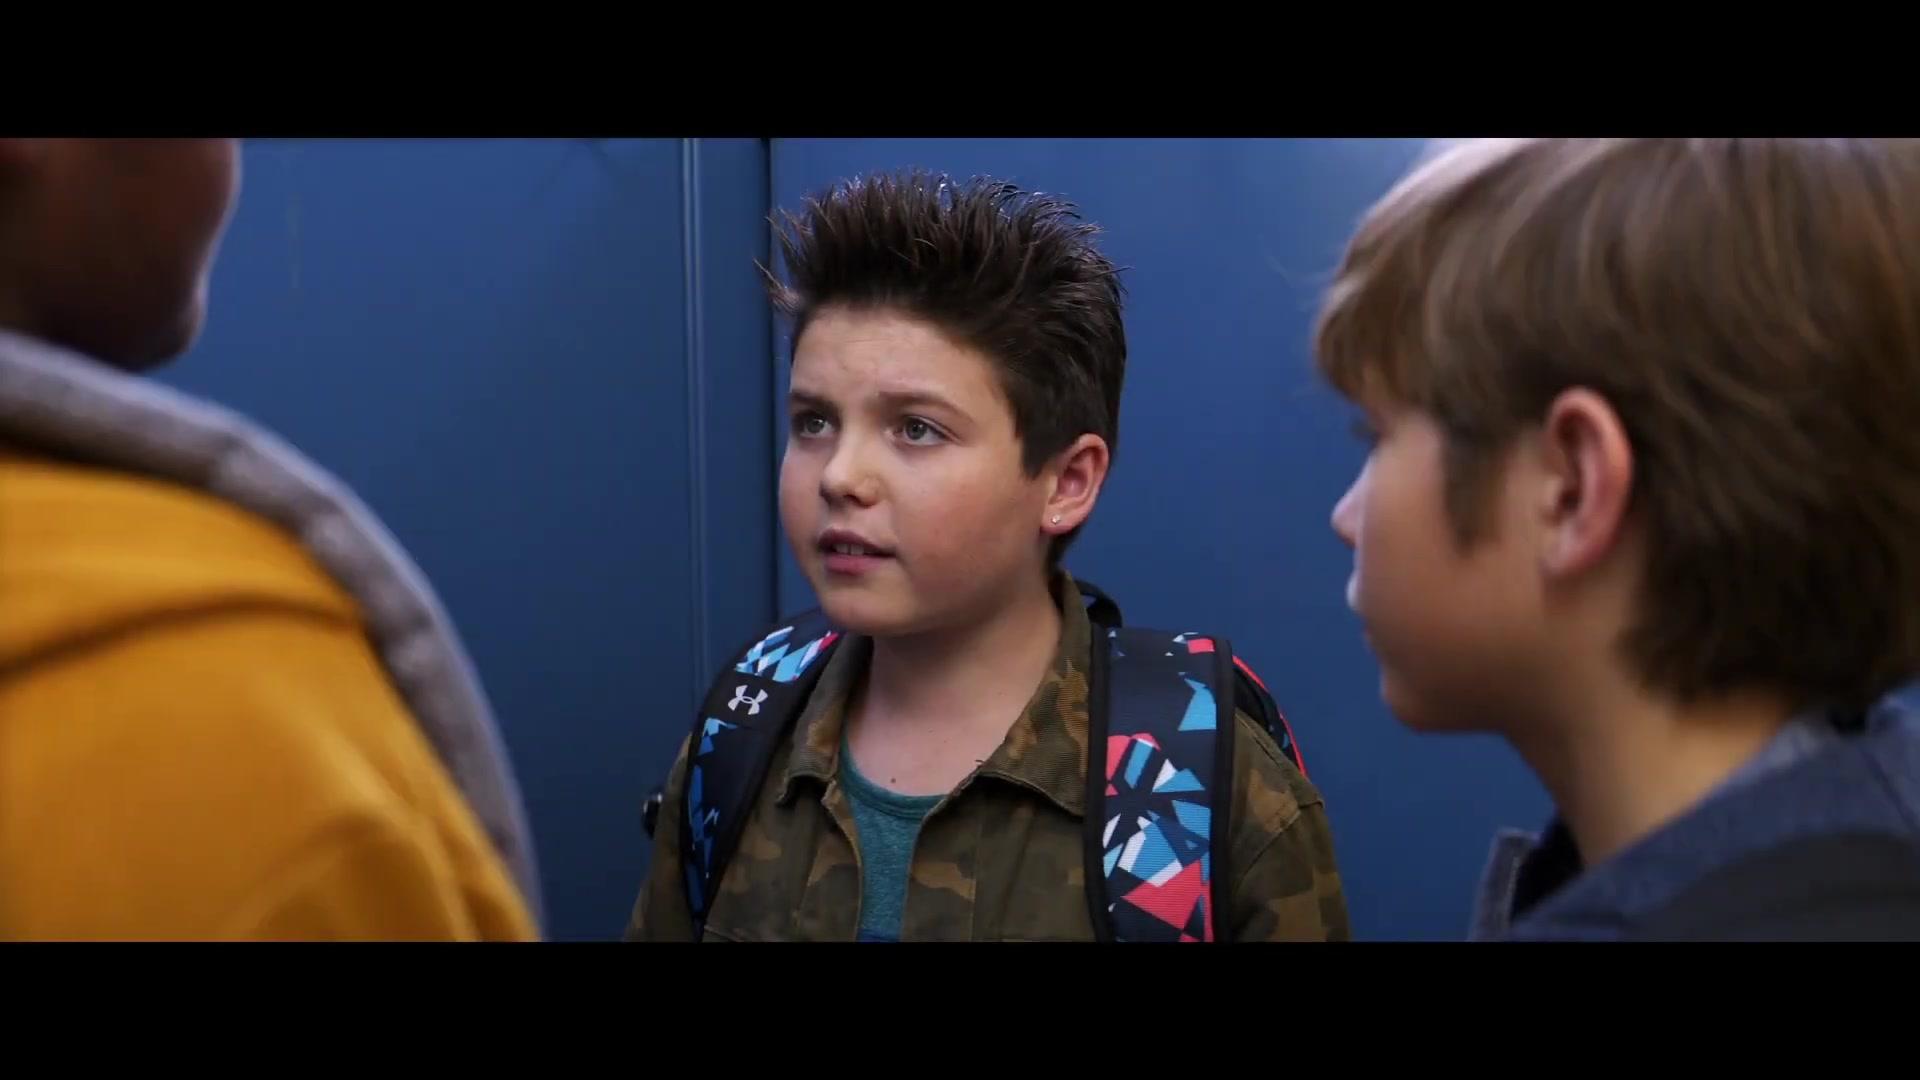 Ua Backpack Used By Brady Noon In Good Boys 2019 Brady noon ist ein amerikanischer schauspieler. brady noon in good boys 2019